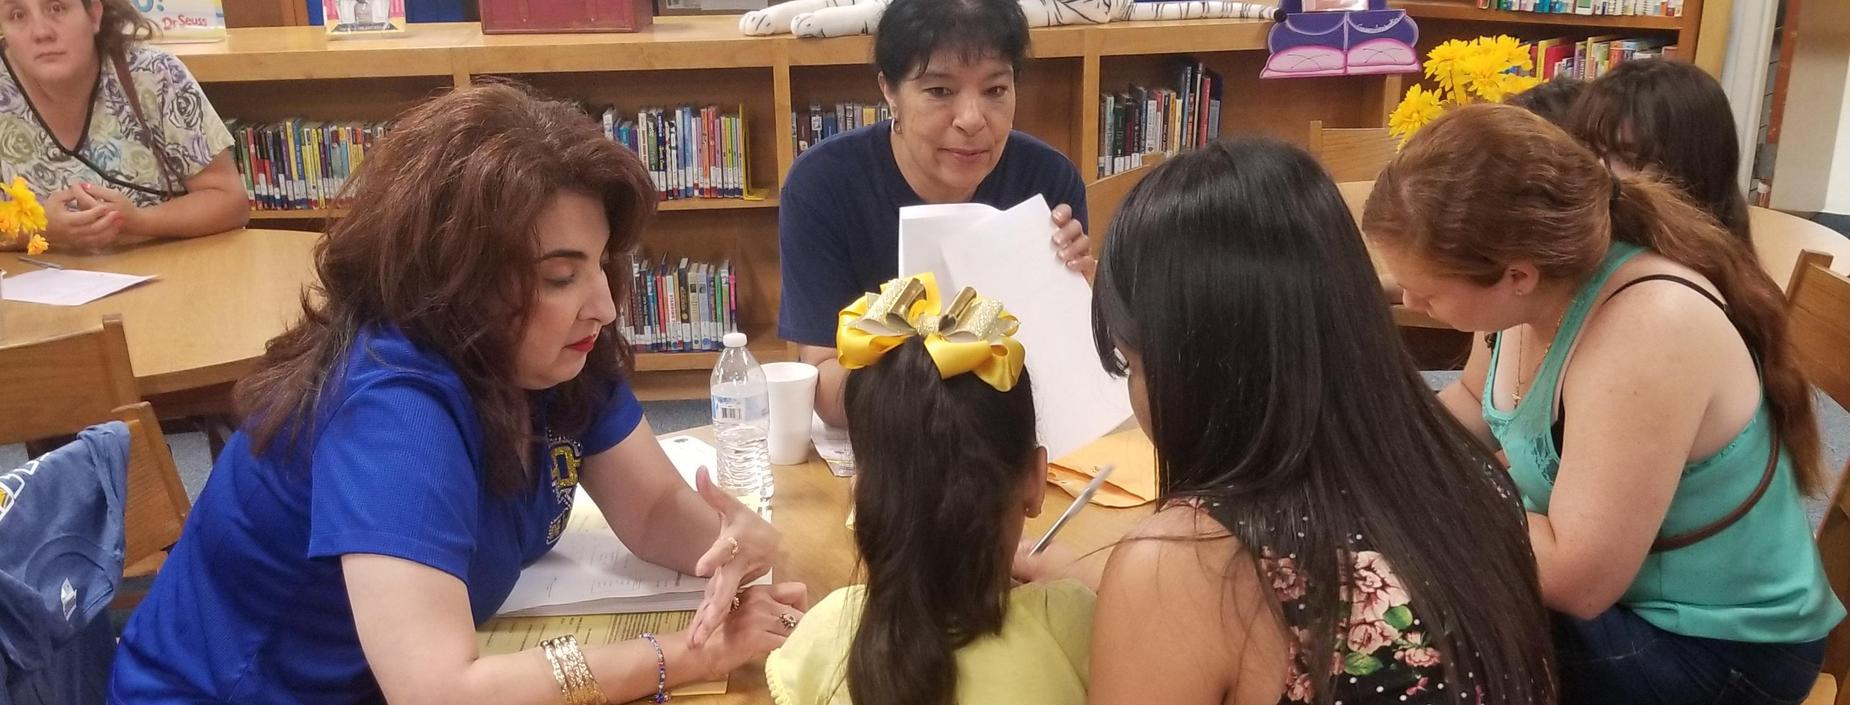 Teachers help parents register children for school